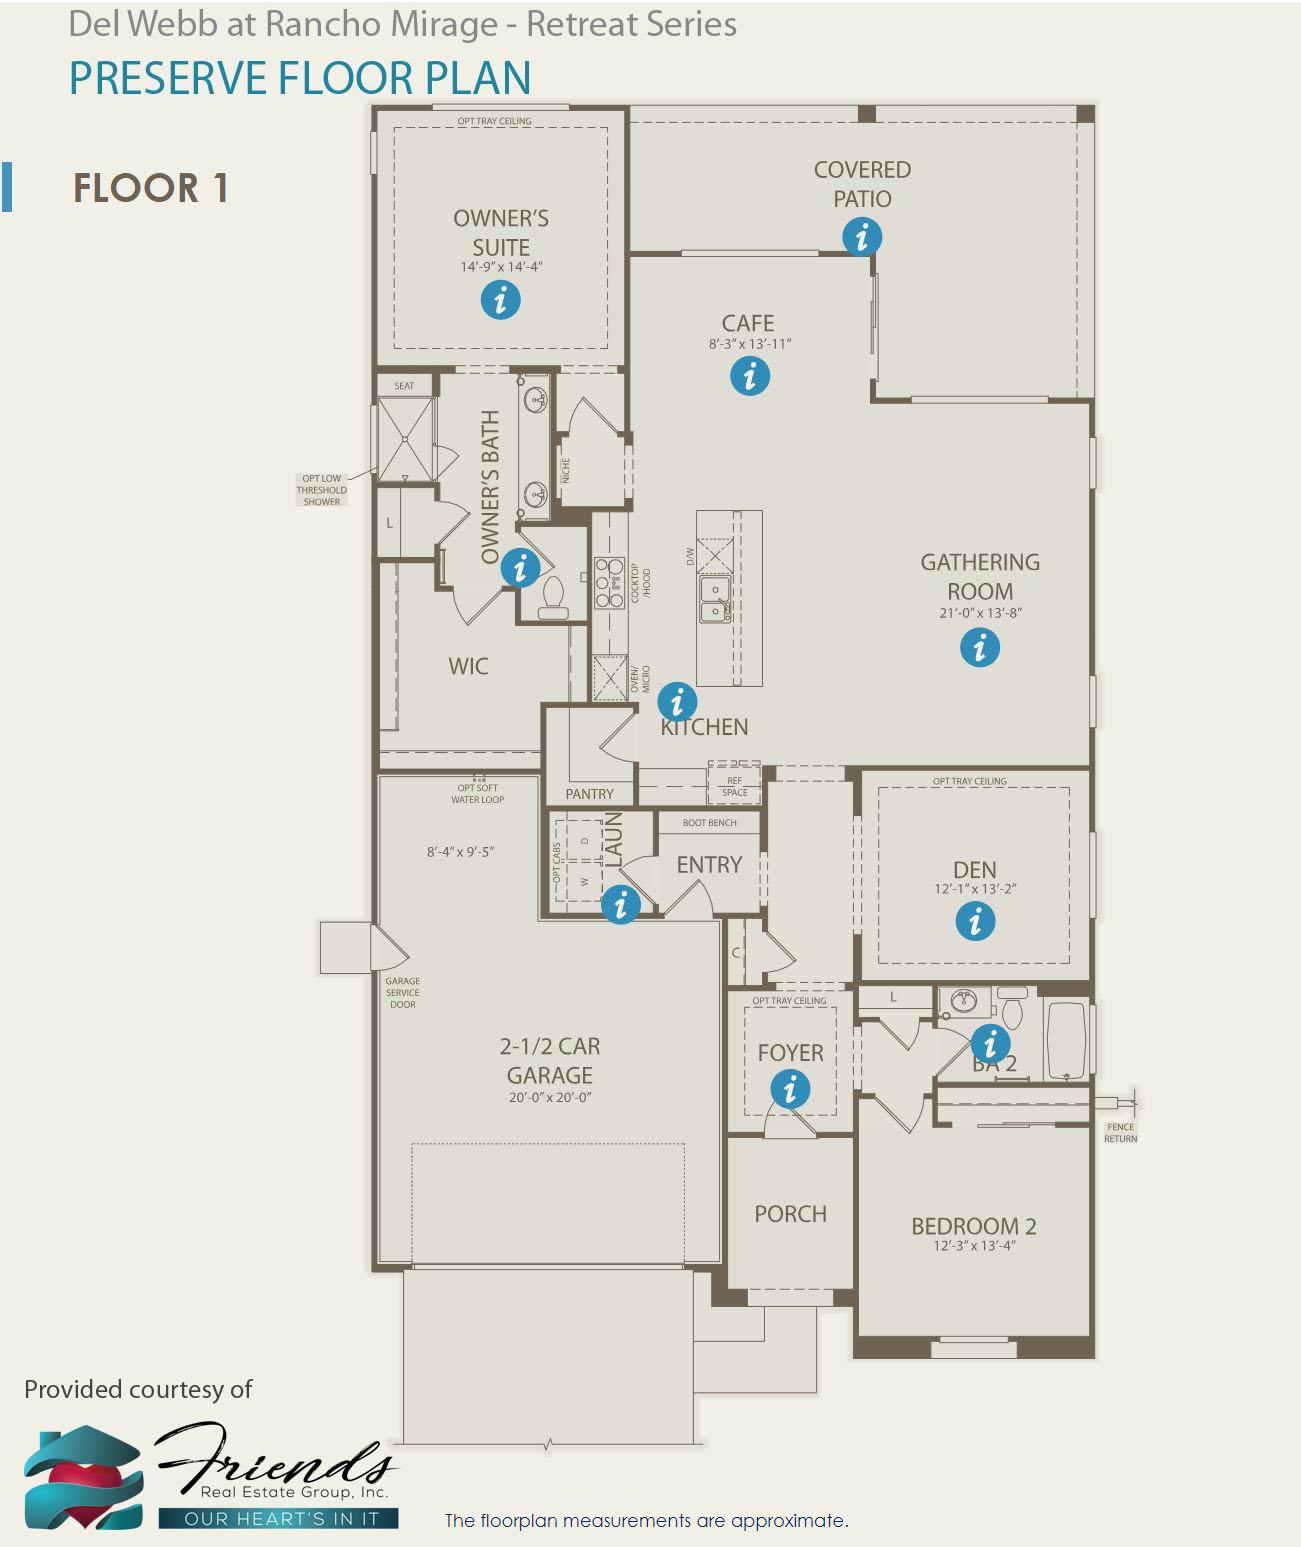 Retreat Series ~ Preserve Floor Plan